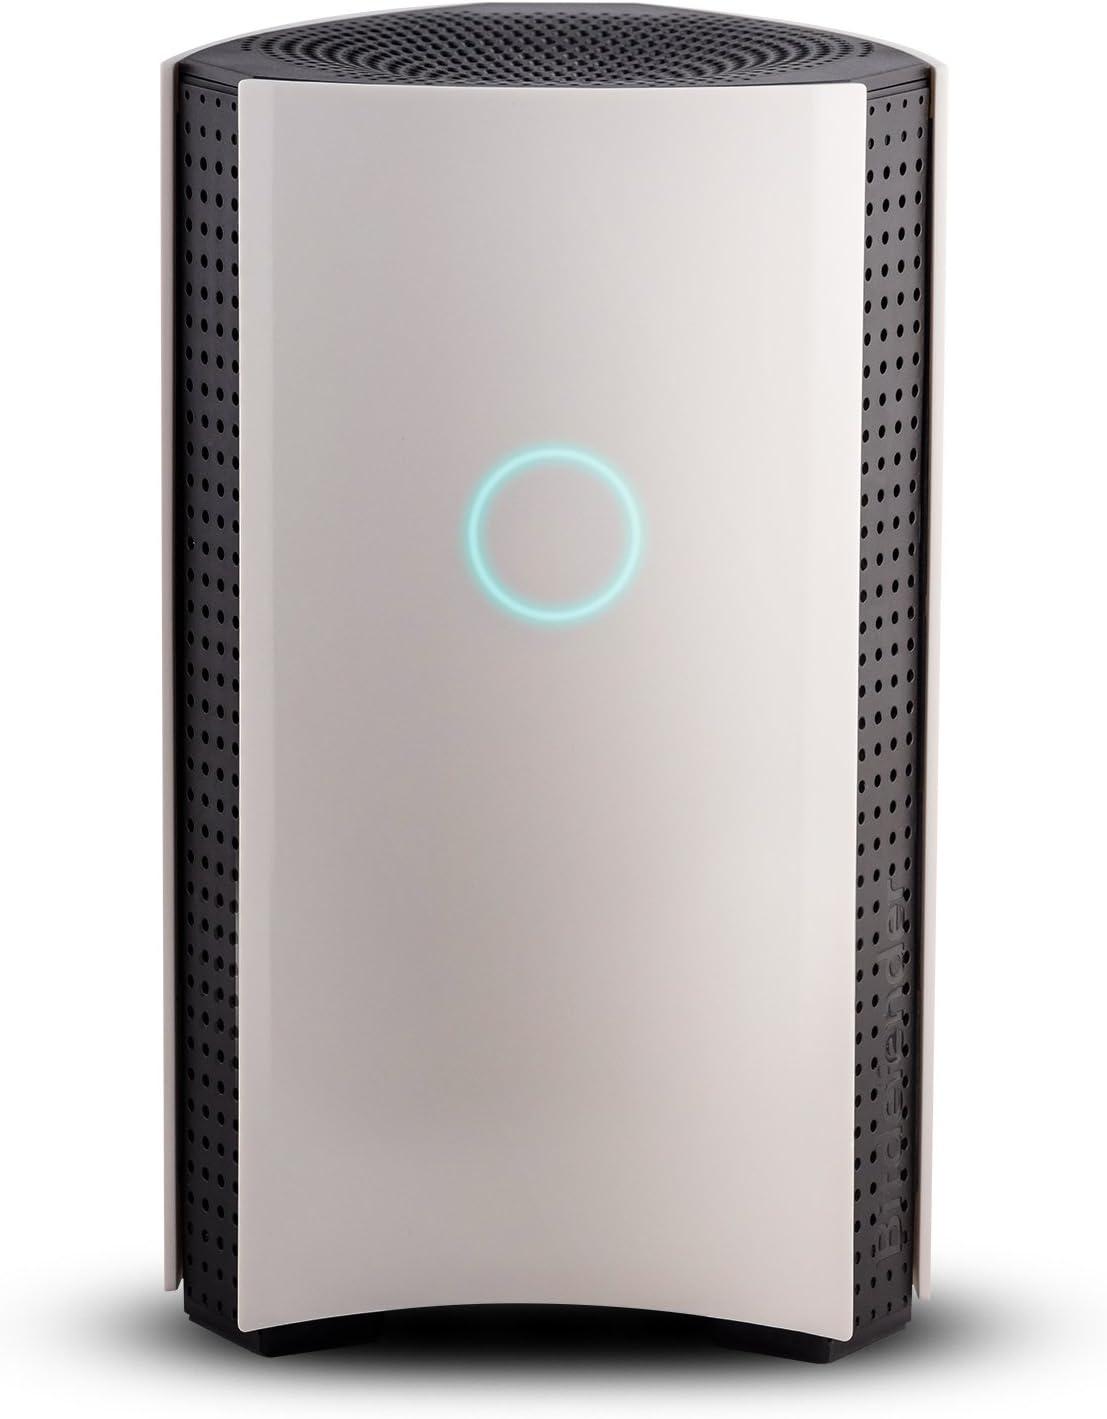 F-Secure FCHXBRQN001G2 SENSE Enterprise Computing  Wireless Routers